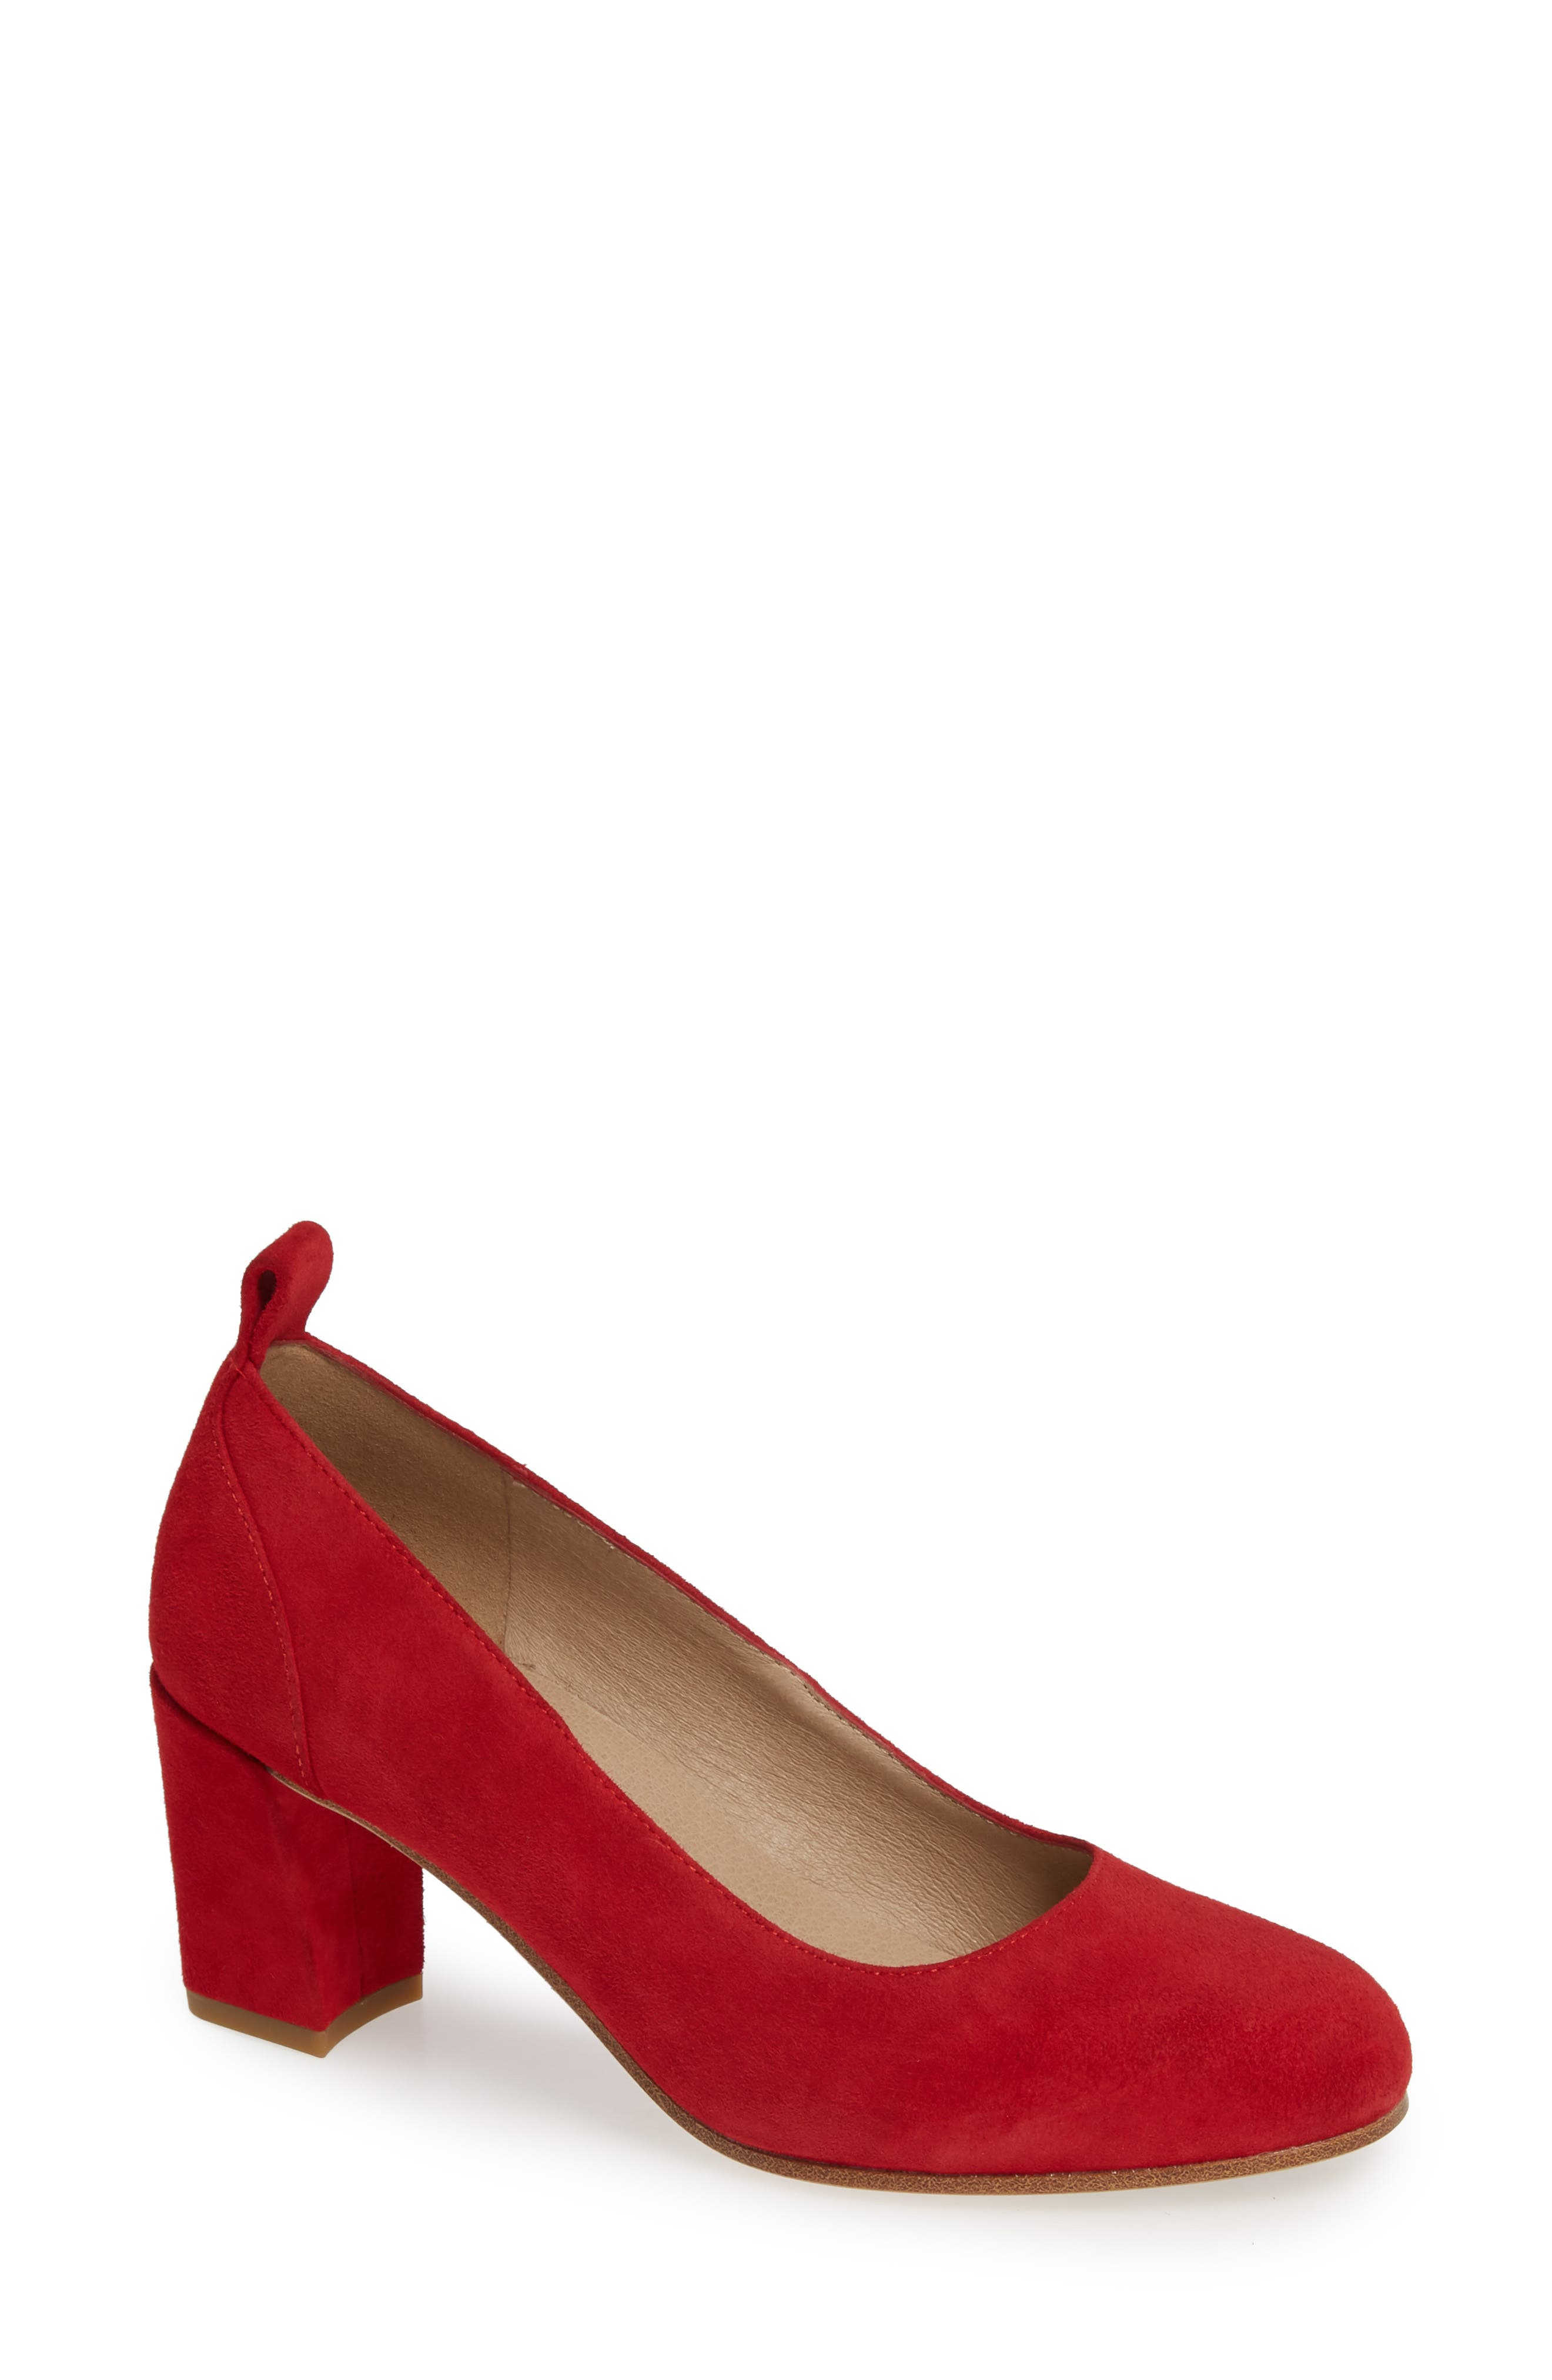 Eileen Fisher Lela Pump, Red